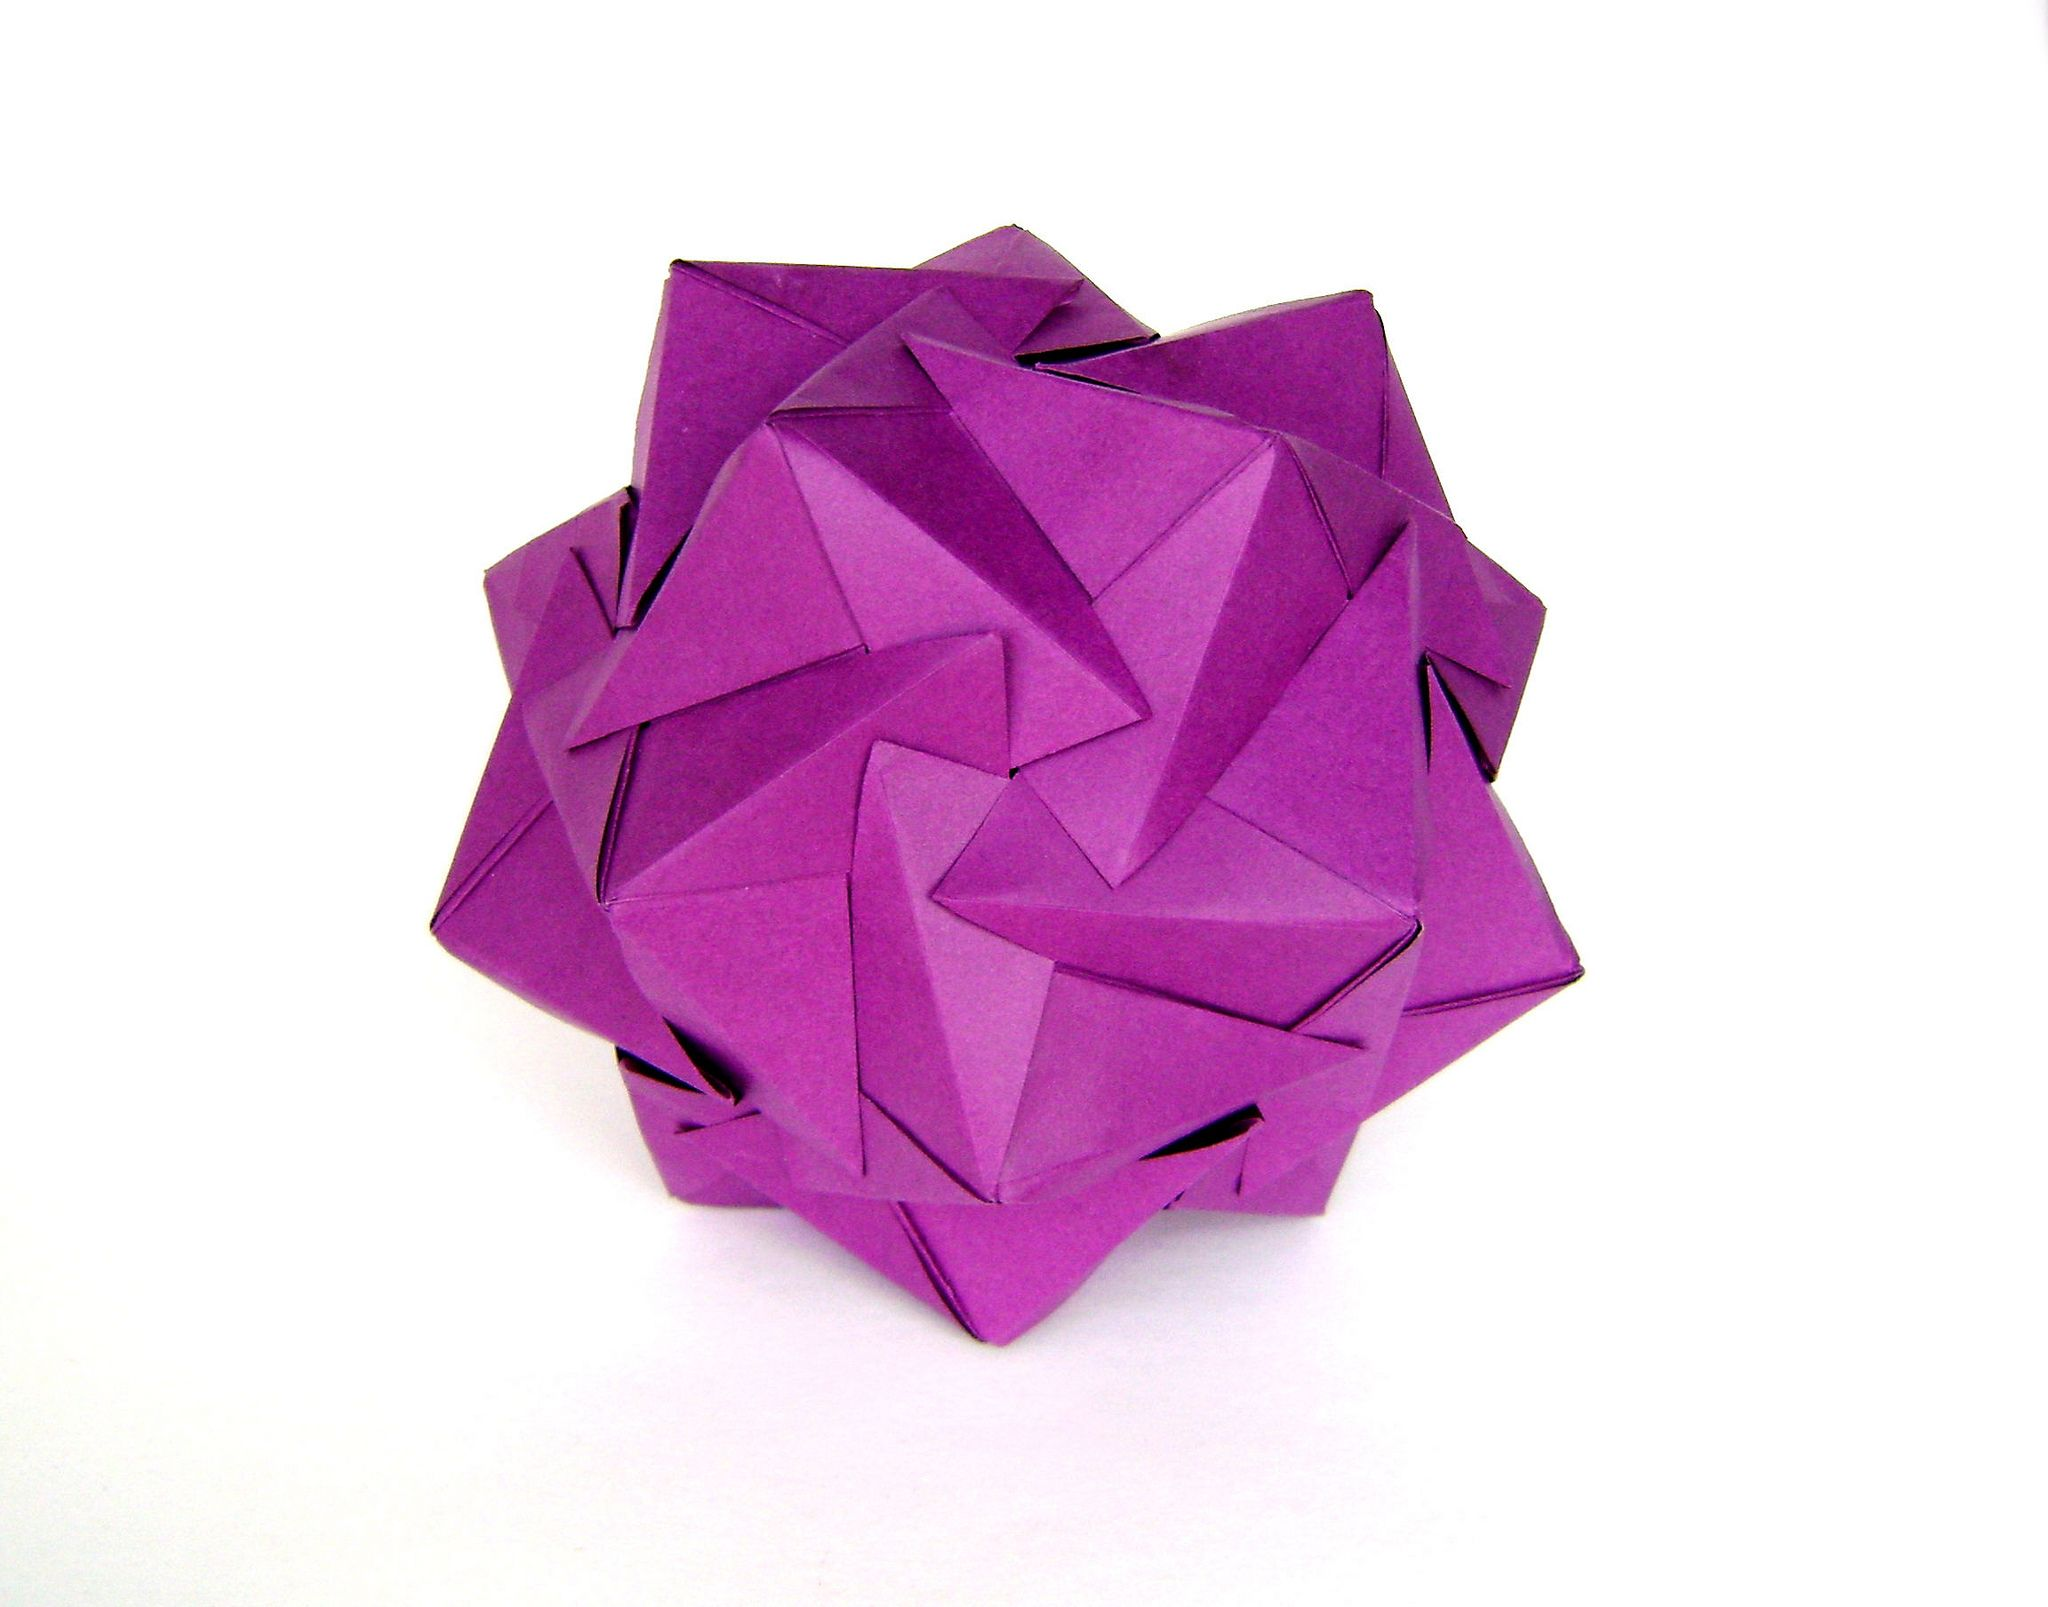 20 Intersecting Cubes Origami Modular Bird Curler Diagram Kusudama Me Craftsorigami Pinterest